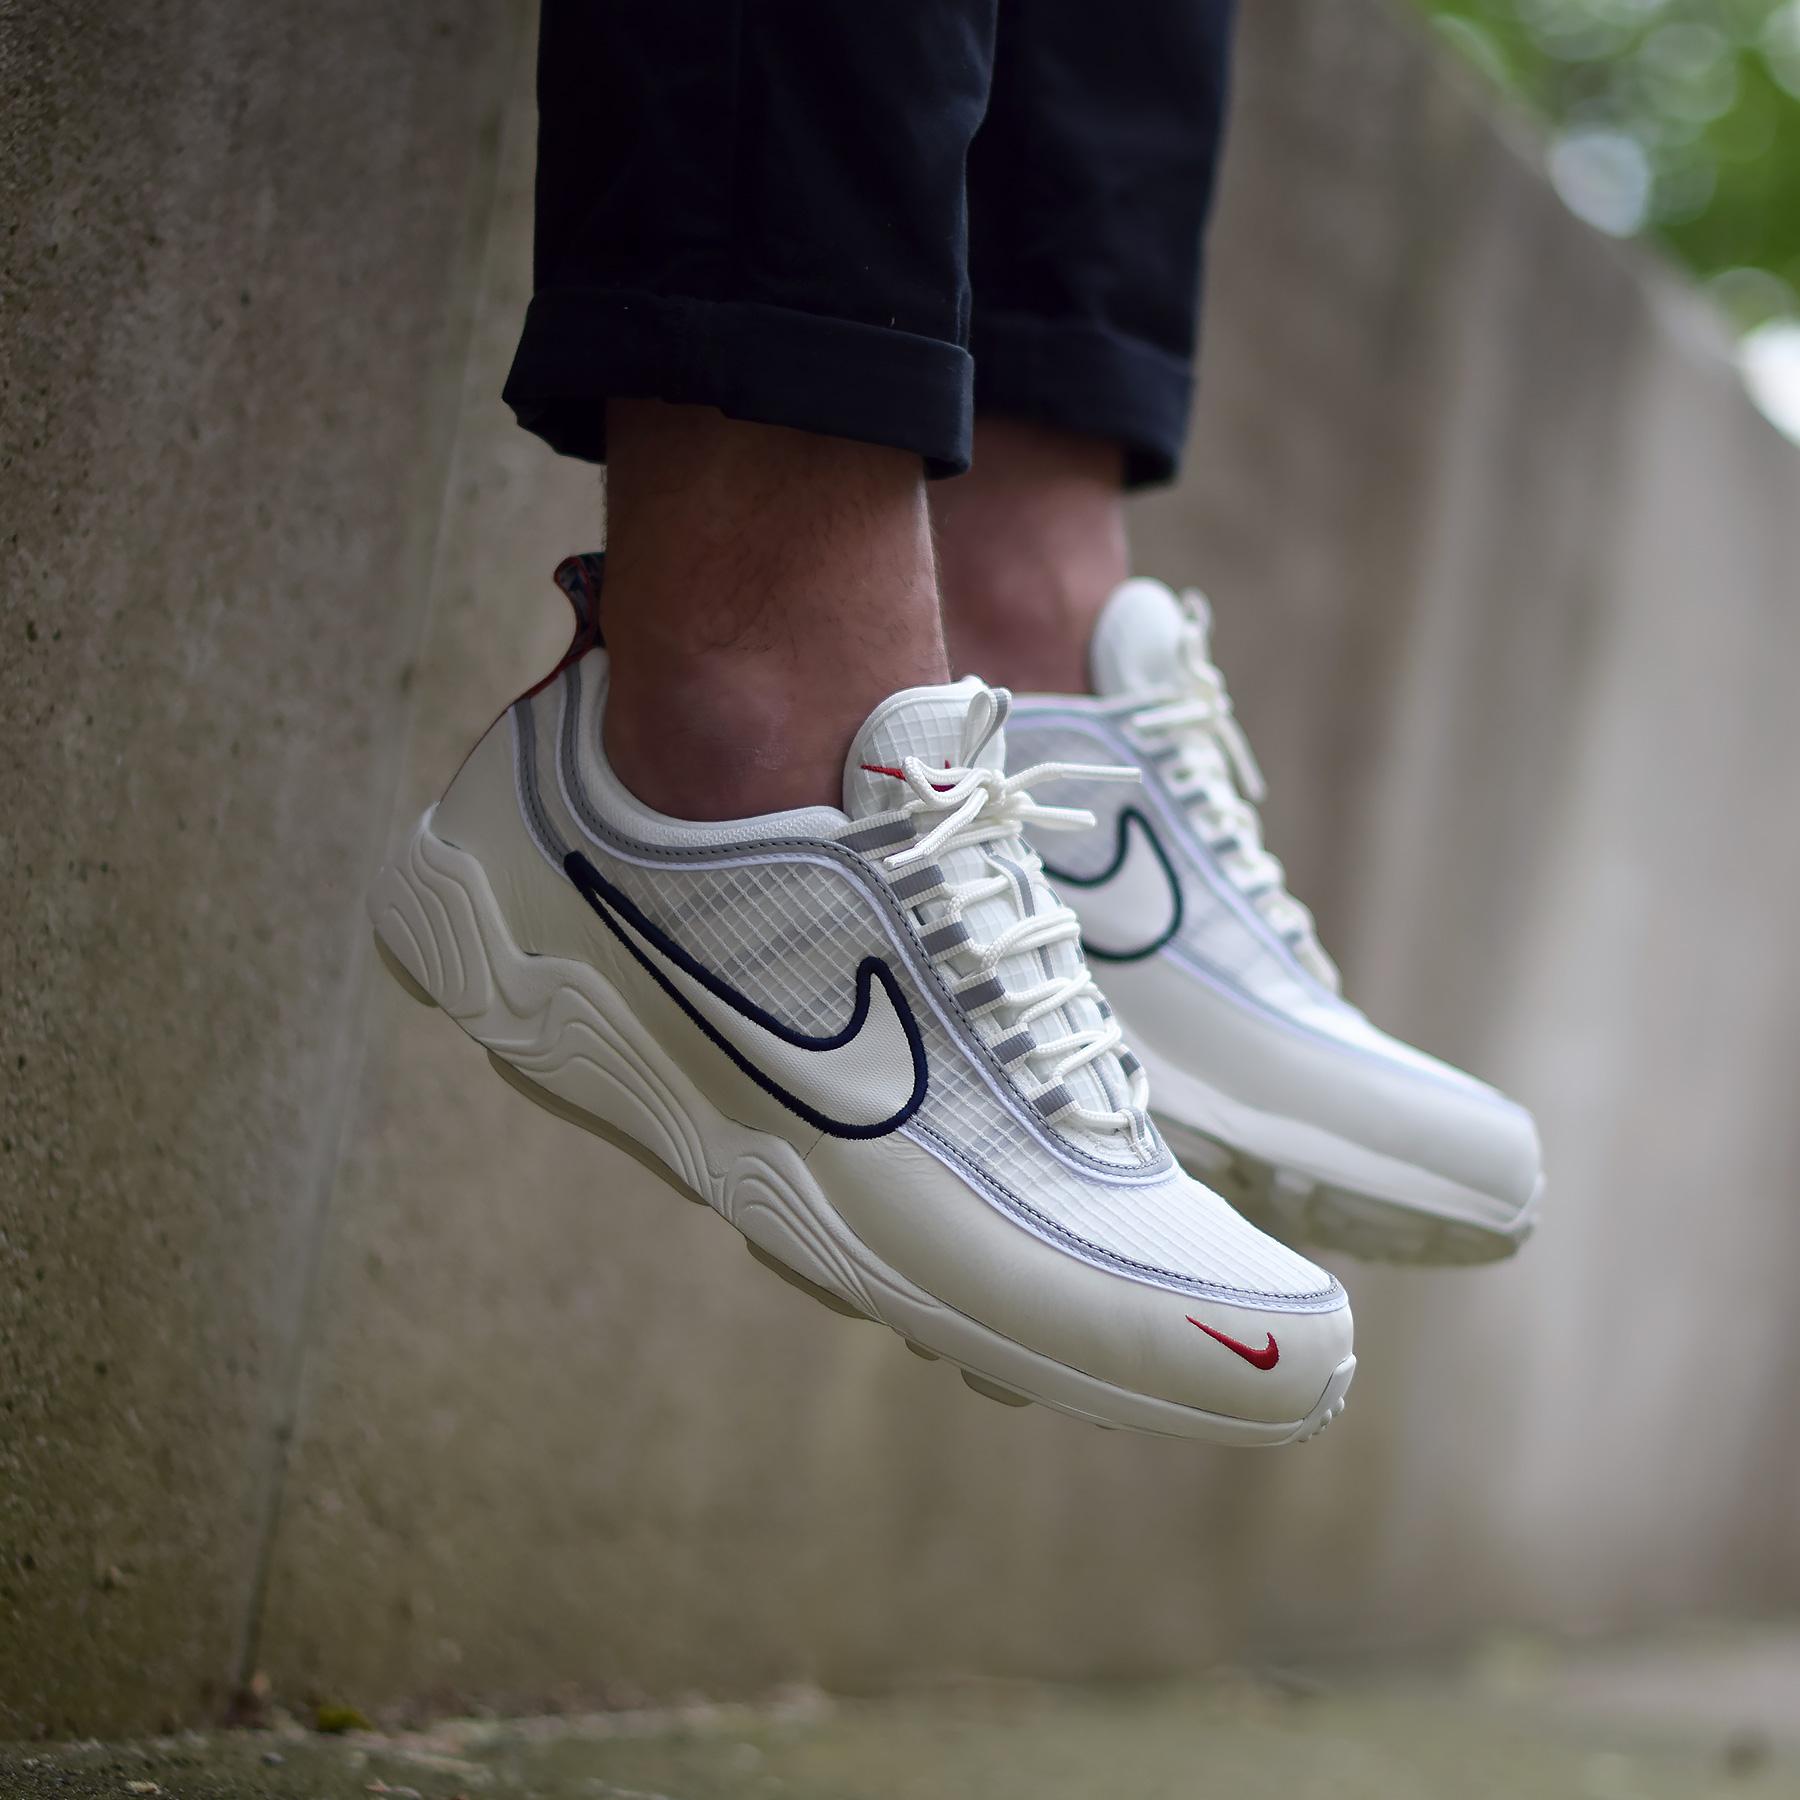 Nike Air Zoom Spiridon SE Pull Tab